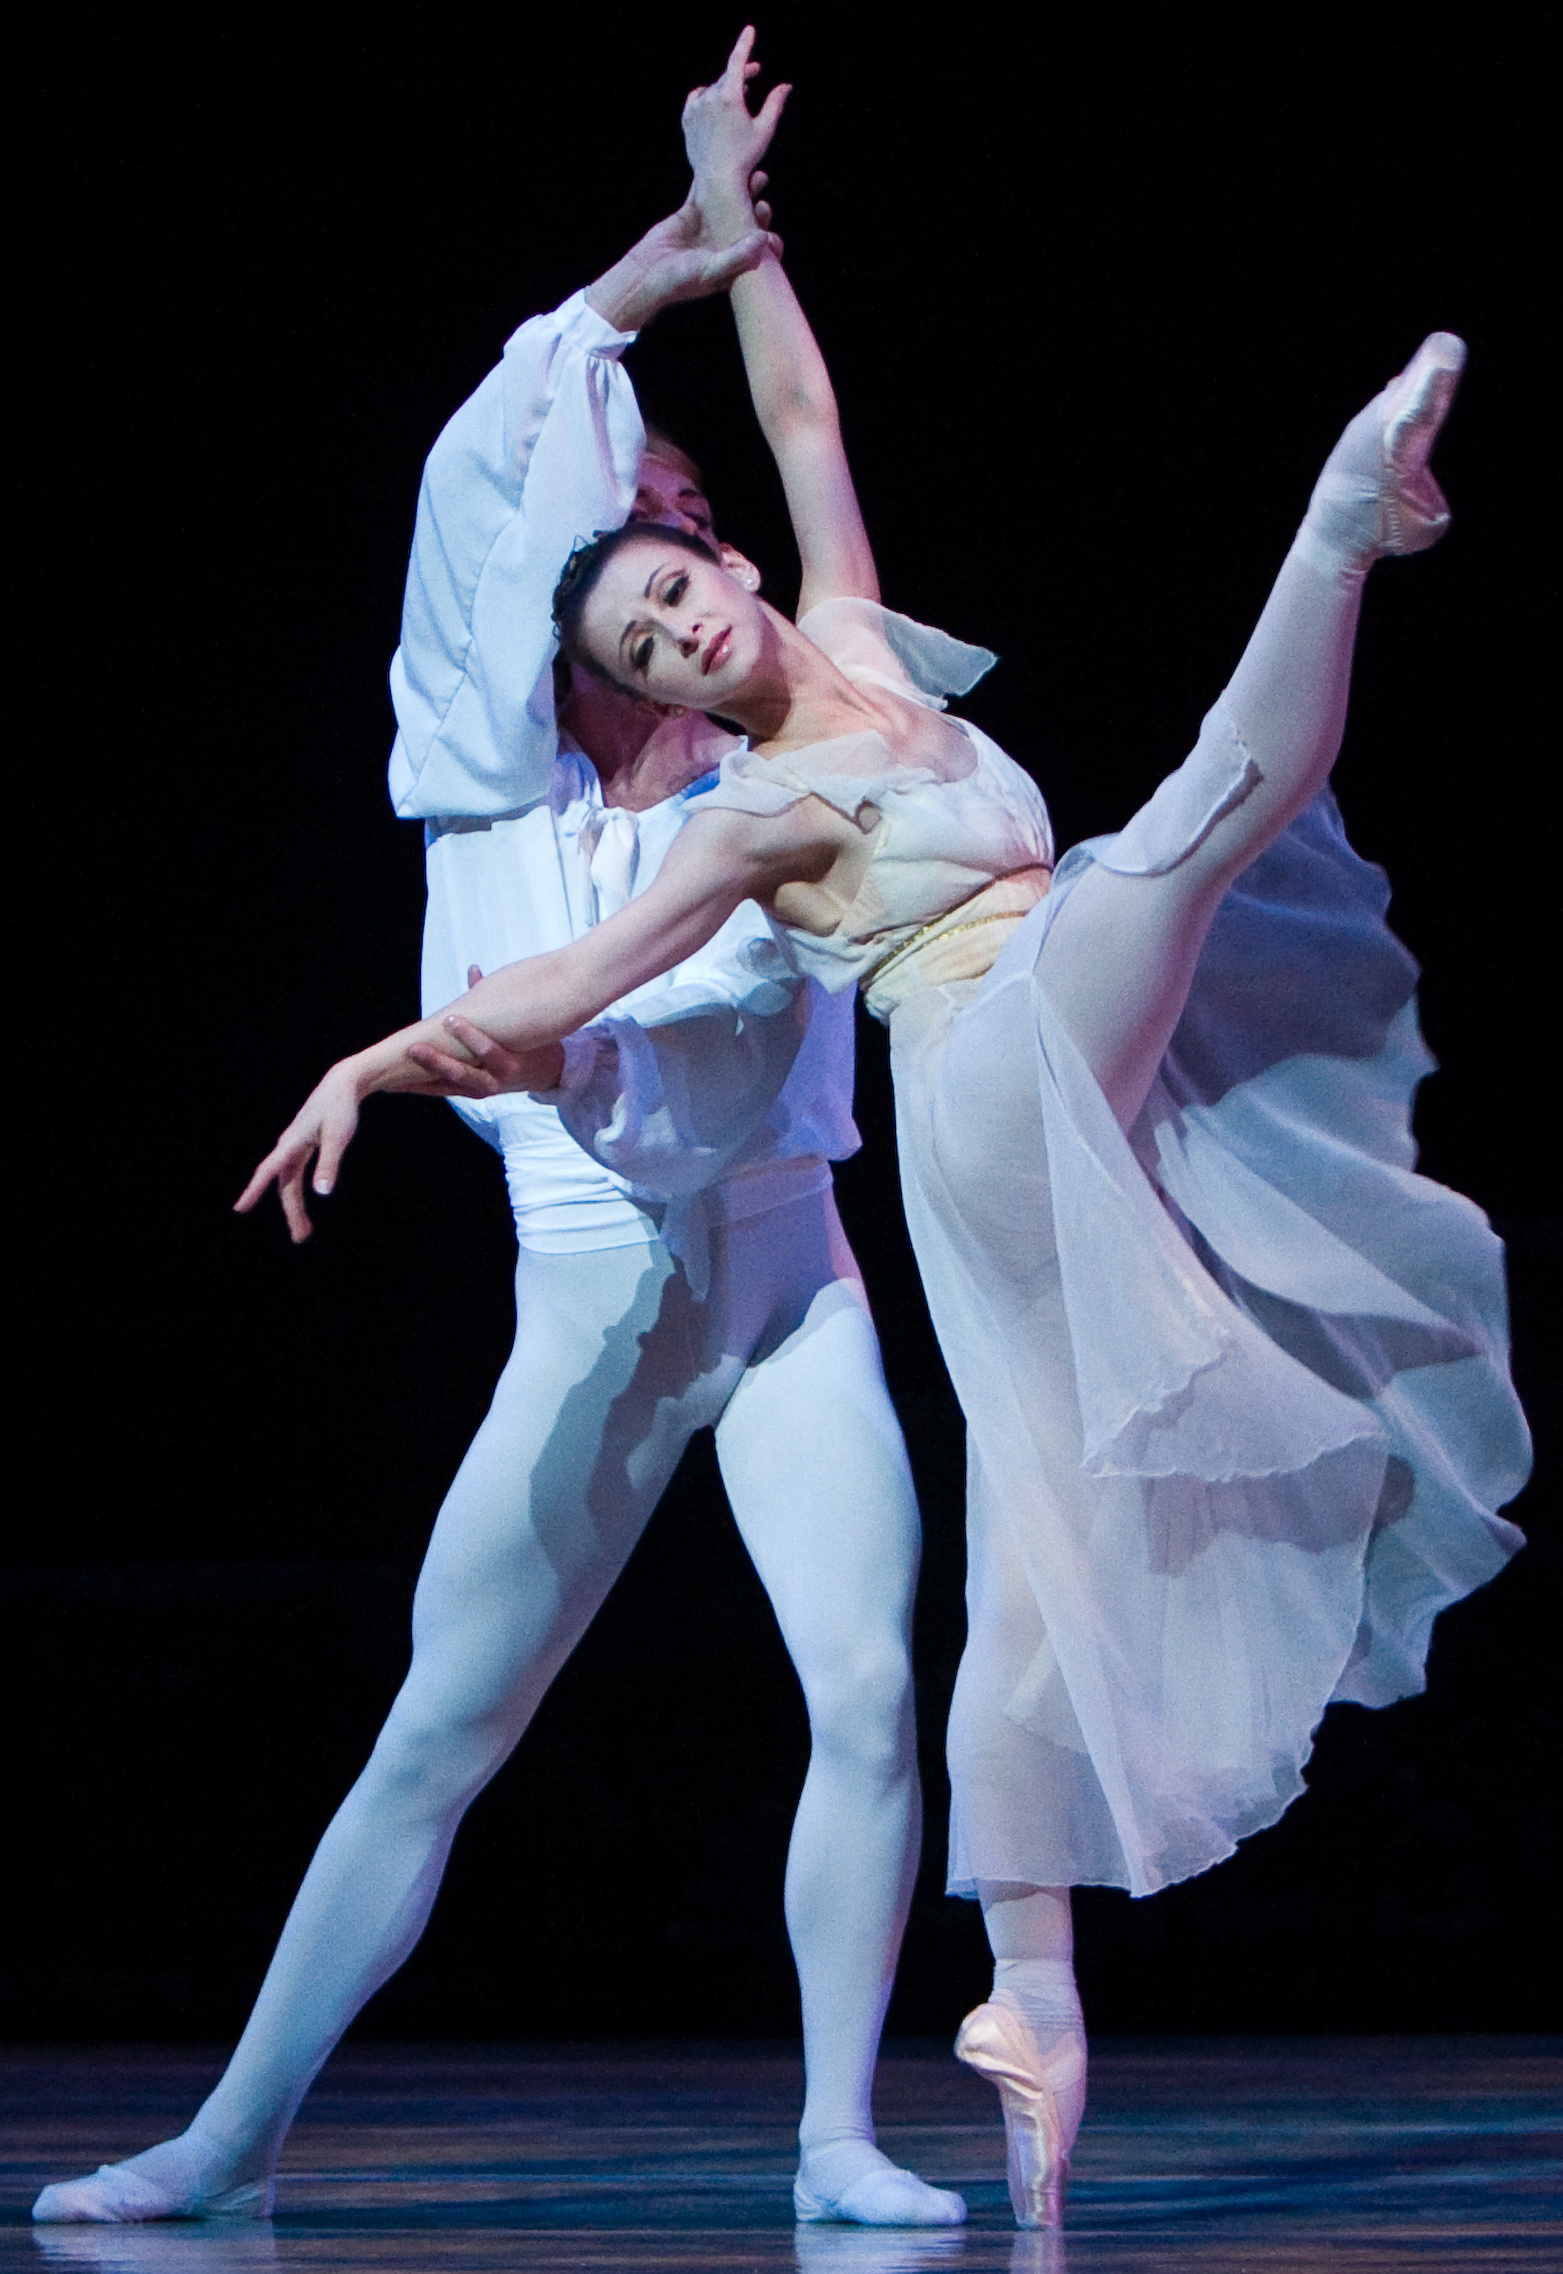 Prima Ballerina Olga Pavlova and Principal Dancer Yevgeni Anfinogenov. Photo by Edward Casati, courtesy of ARTS SA.